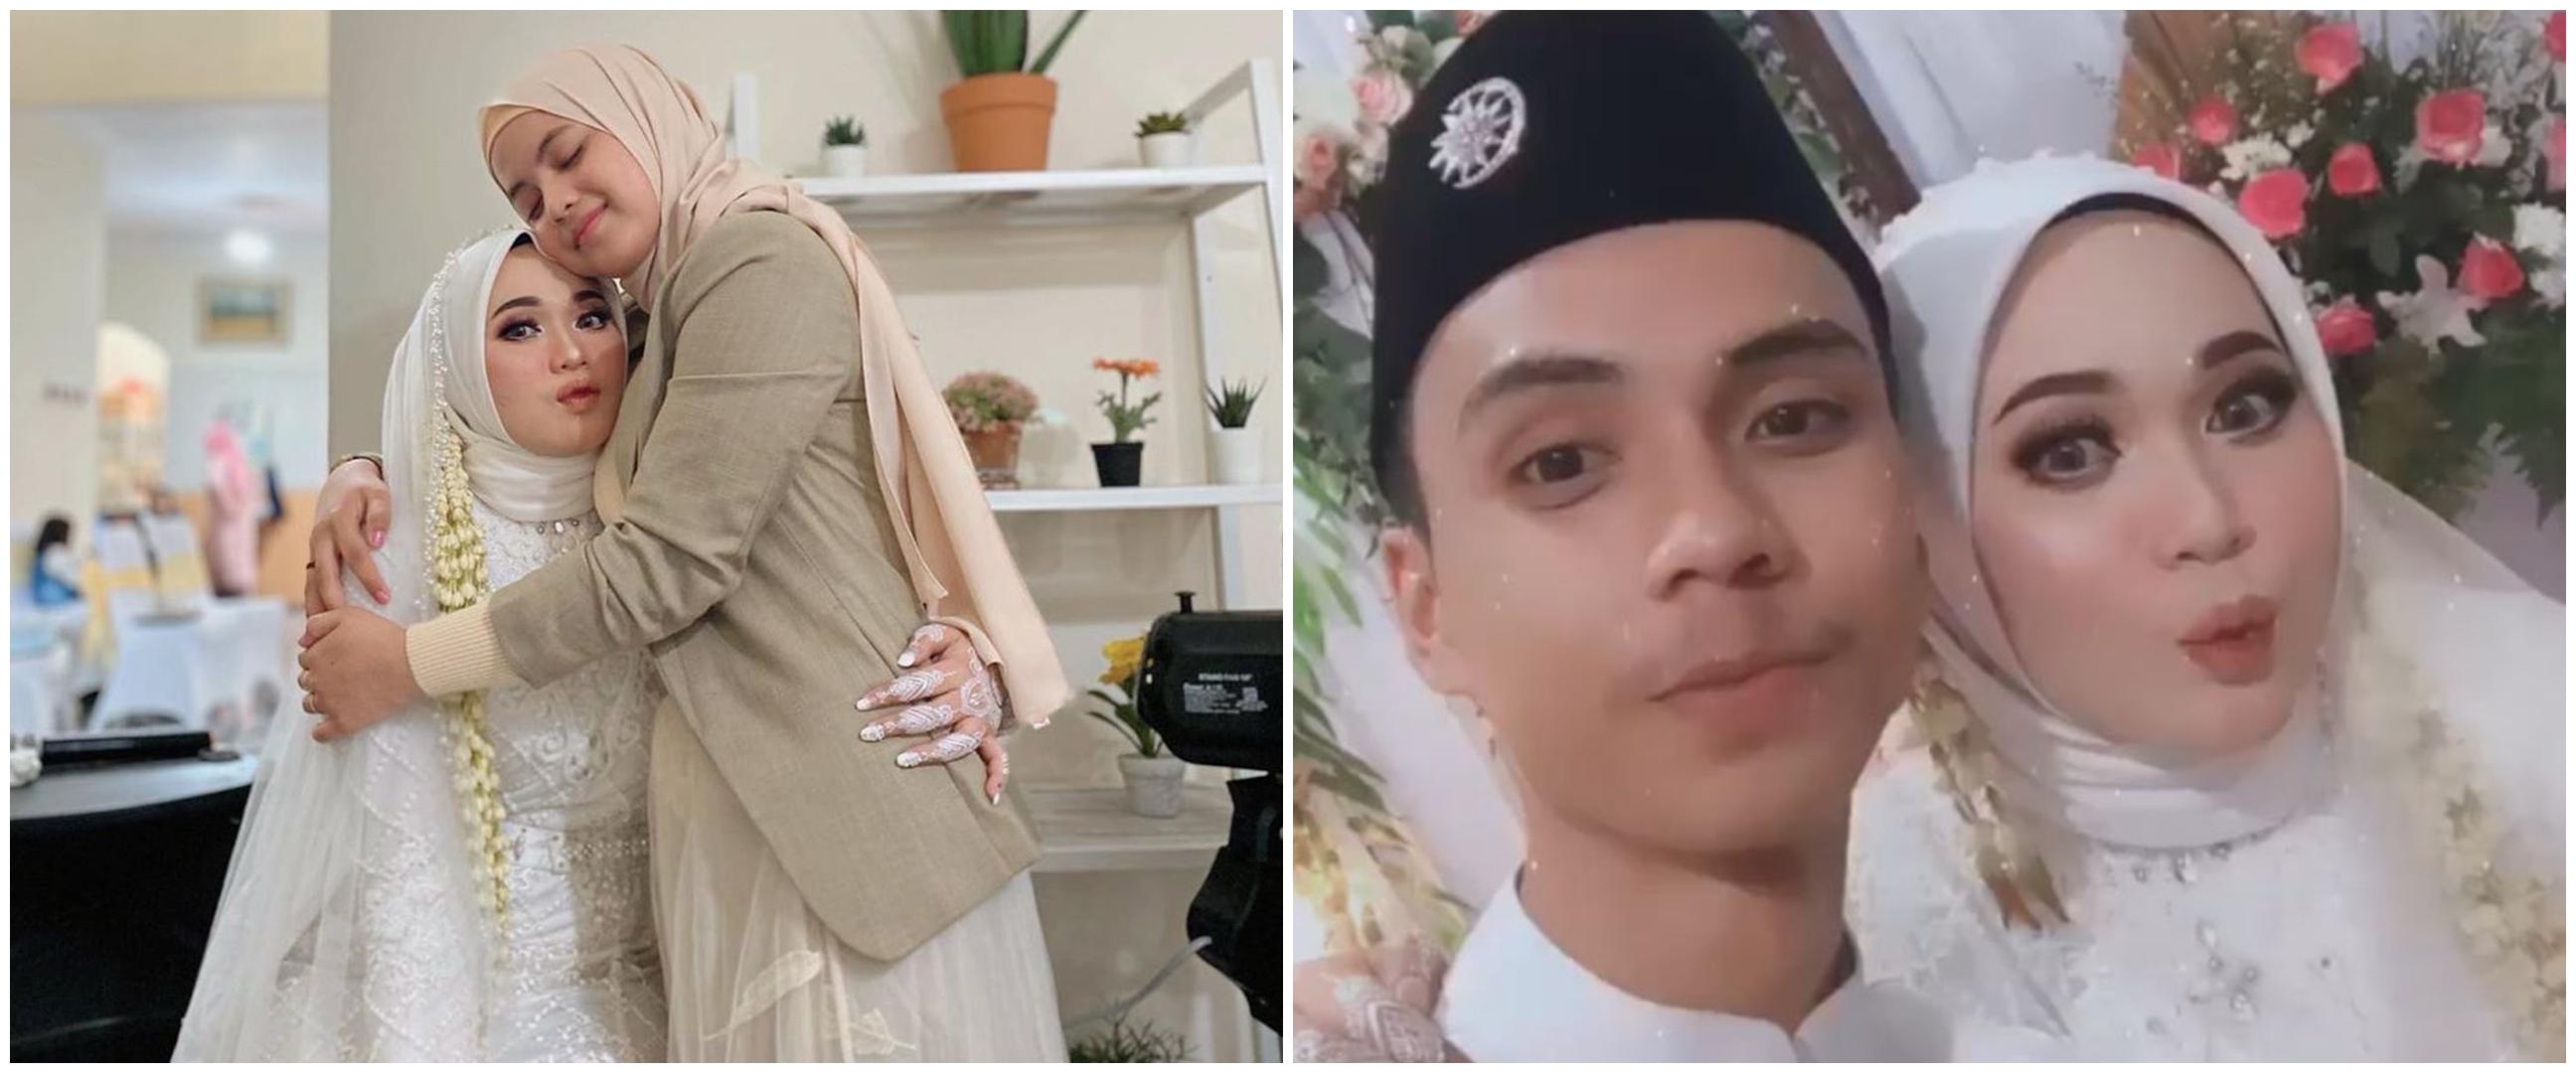 8 Momen pernikahan Anisa Rahman eks Sabyan Gambus, penuh kebahagiaan